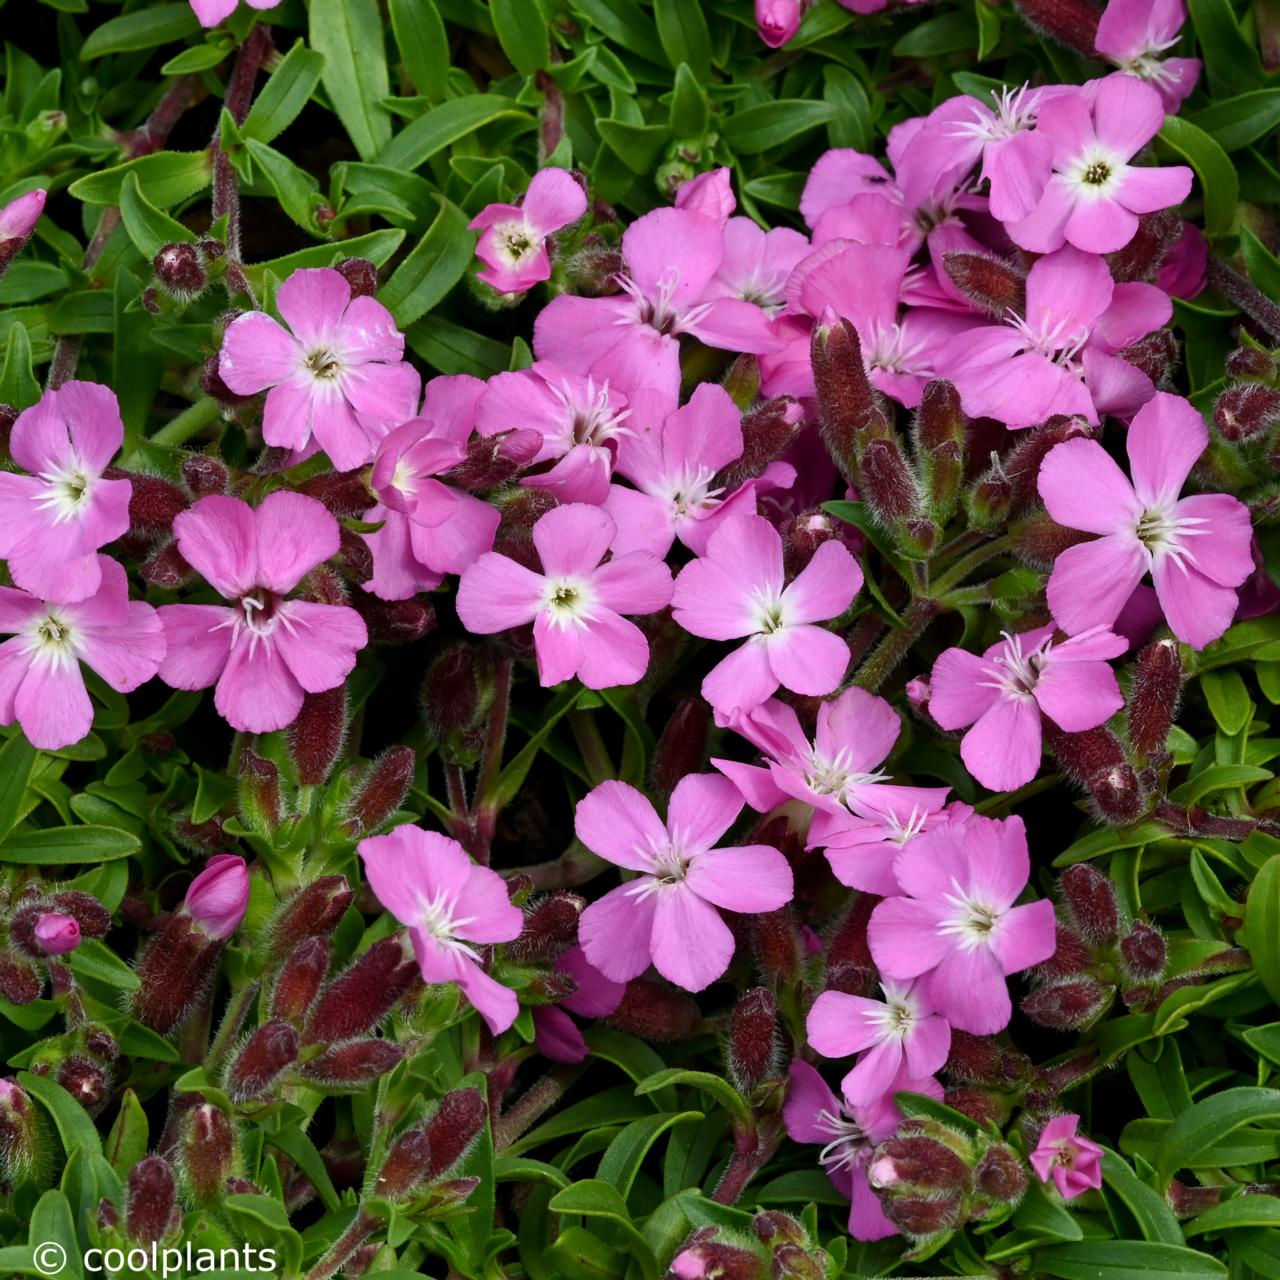 Saponaria 'Bressingham' plant